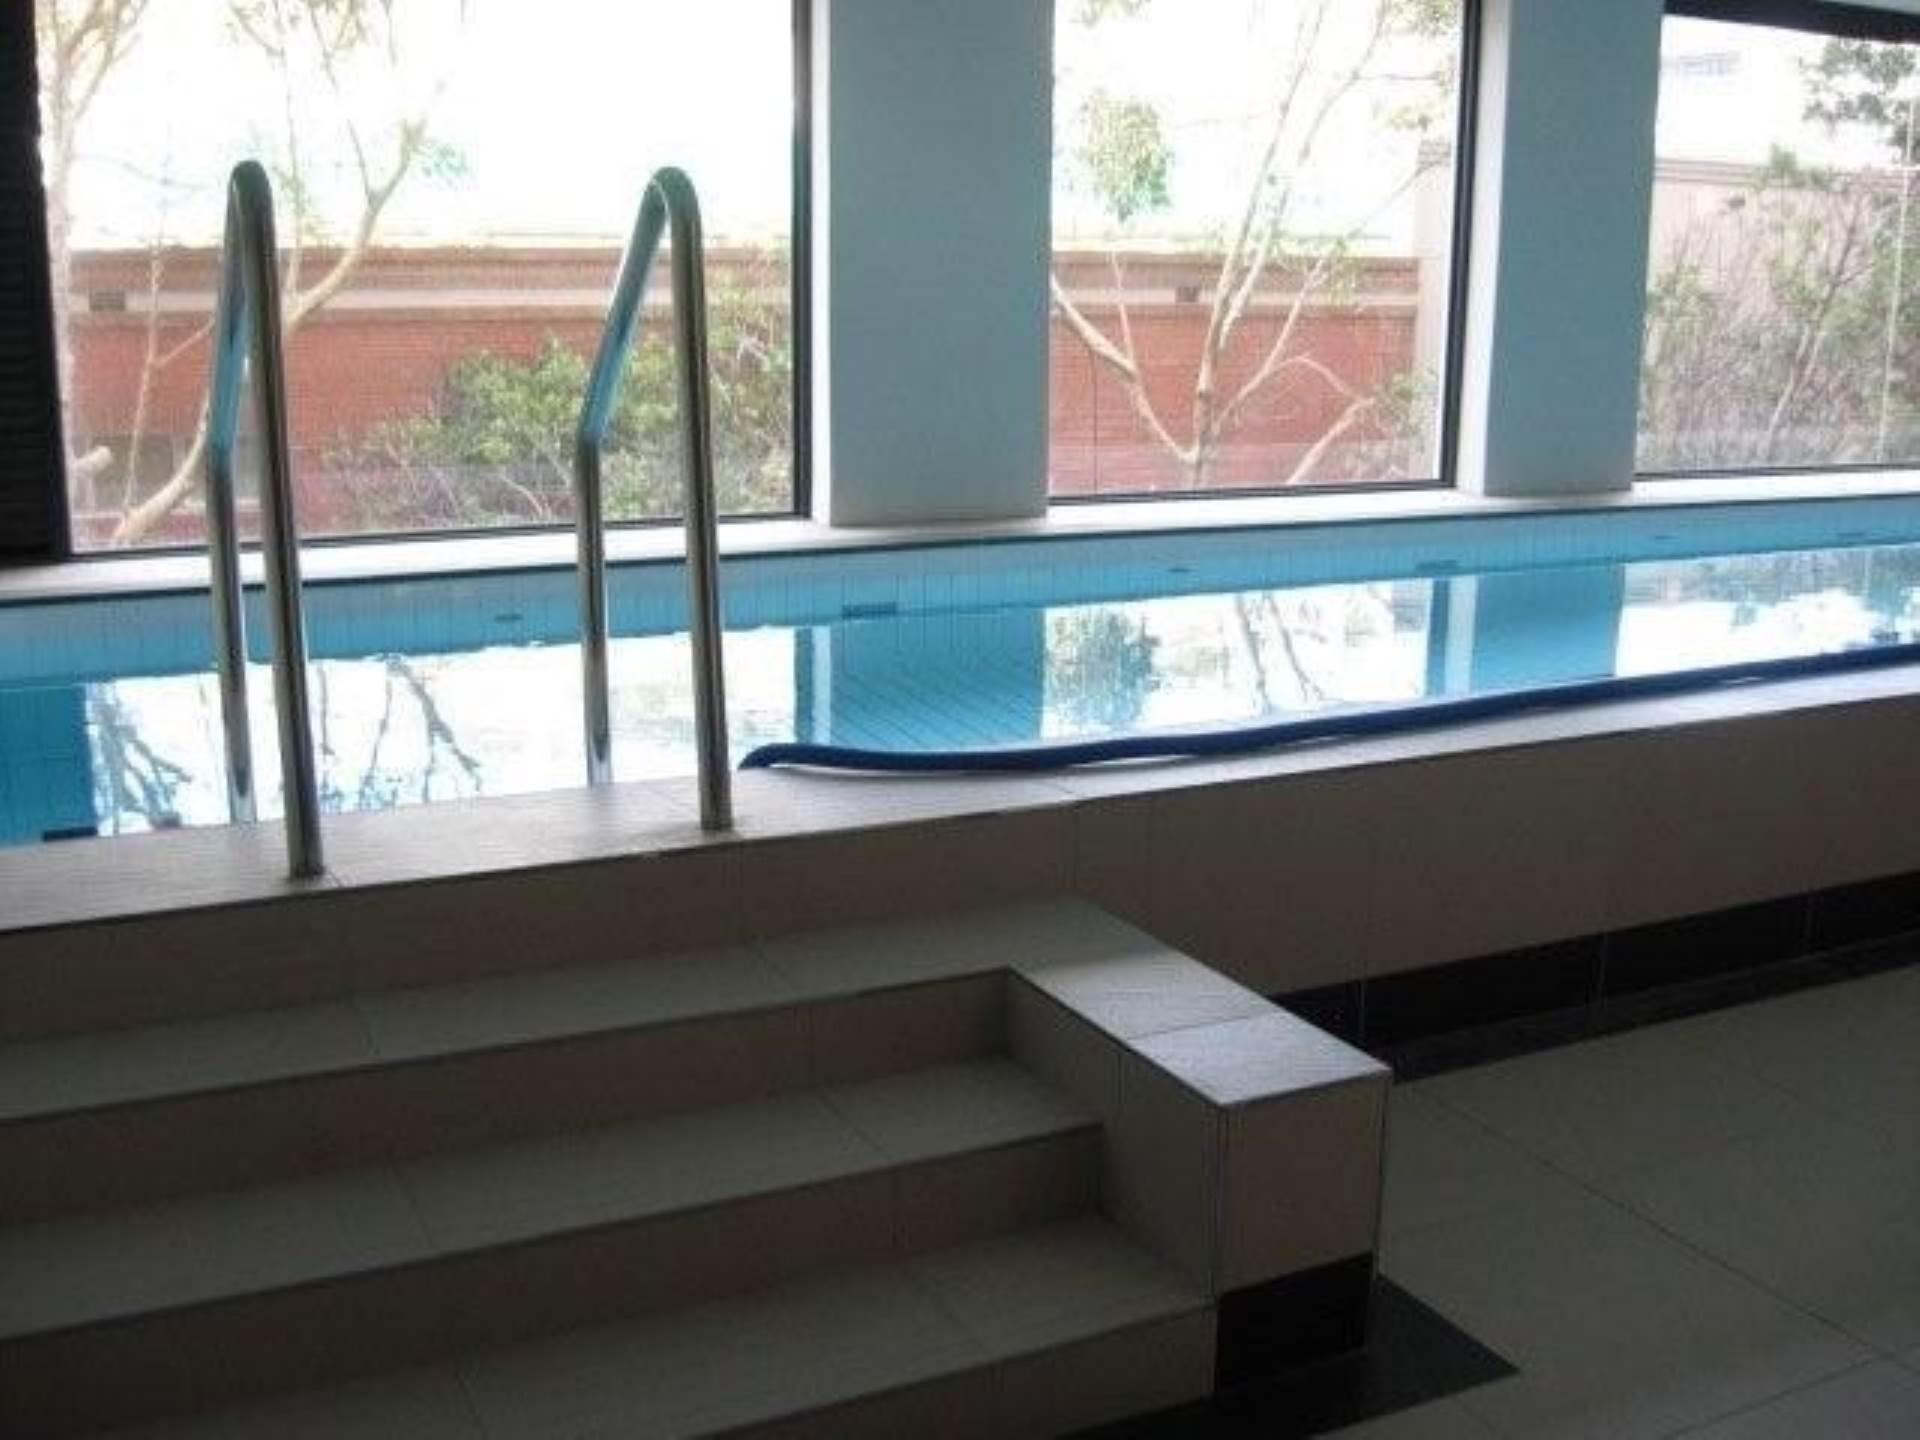 De Waterkant property for sale. Ref No: 13475436. Picture no 6